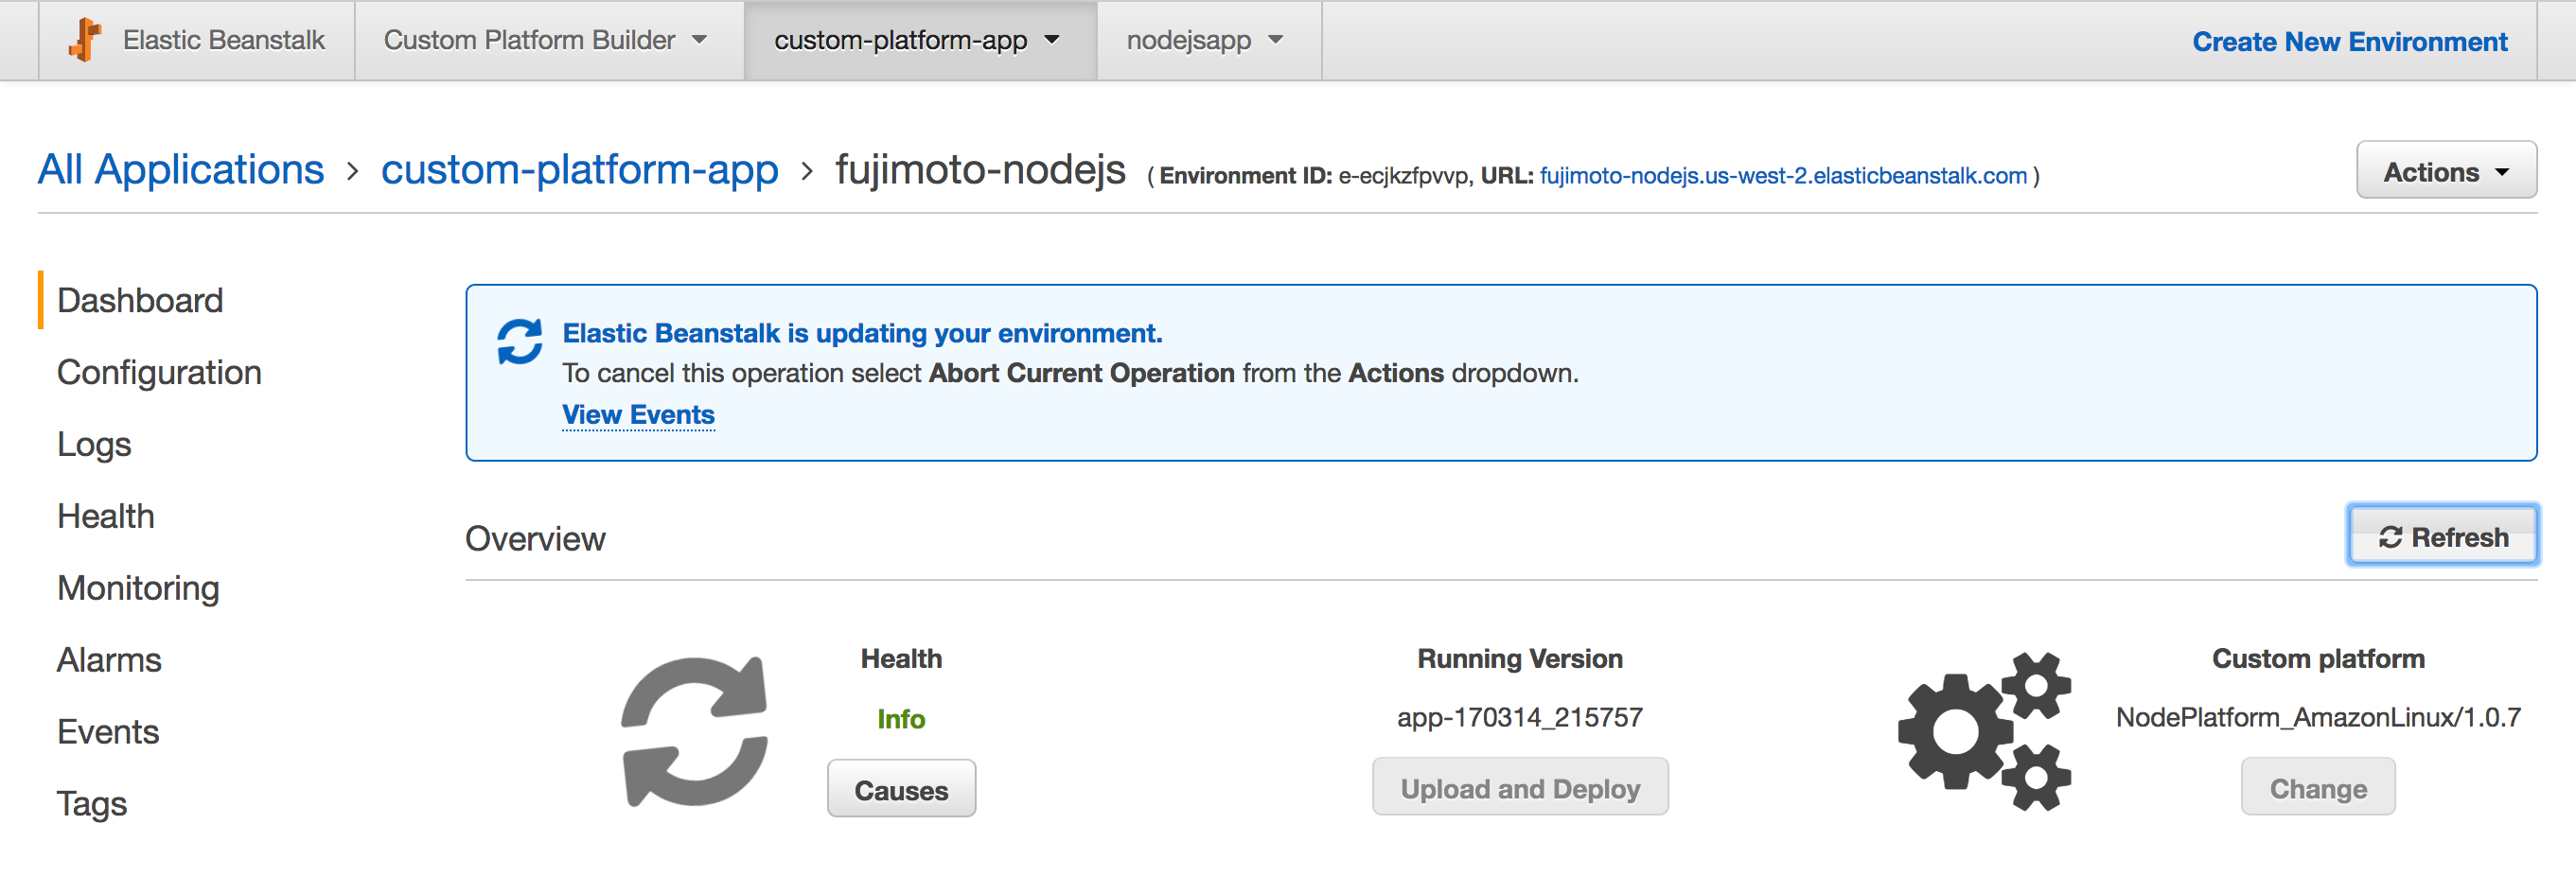 fujimoto-nodejs_-_Dashboard